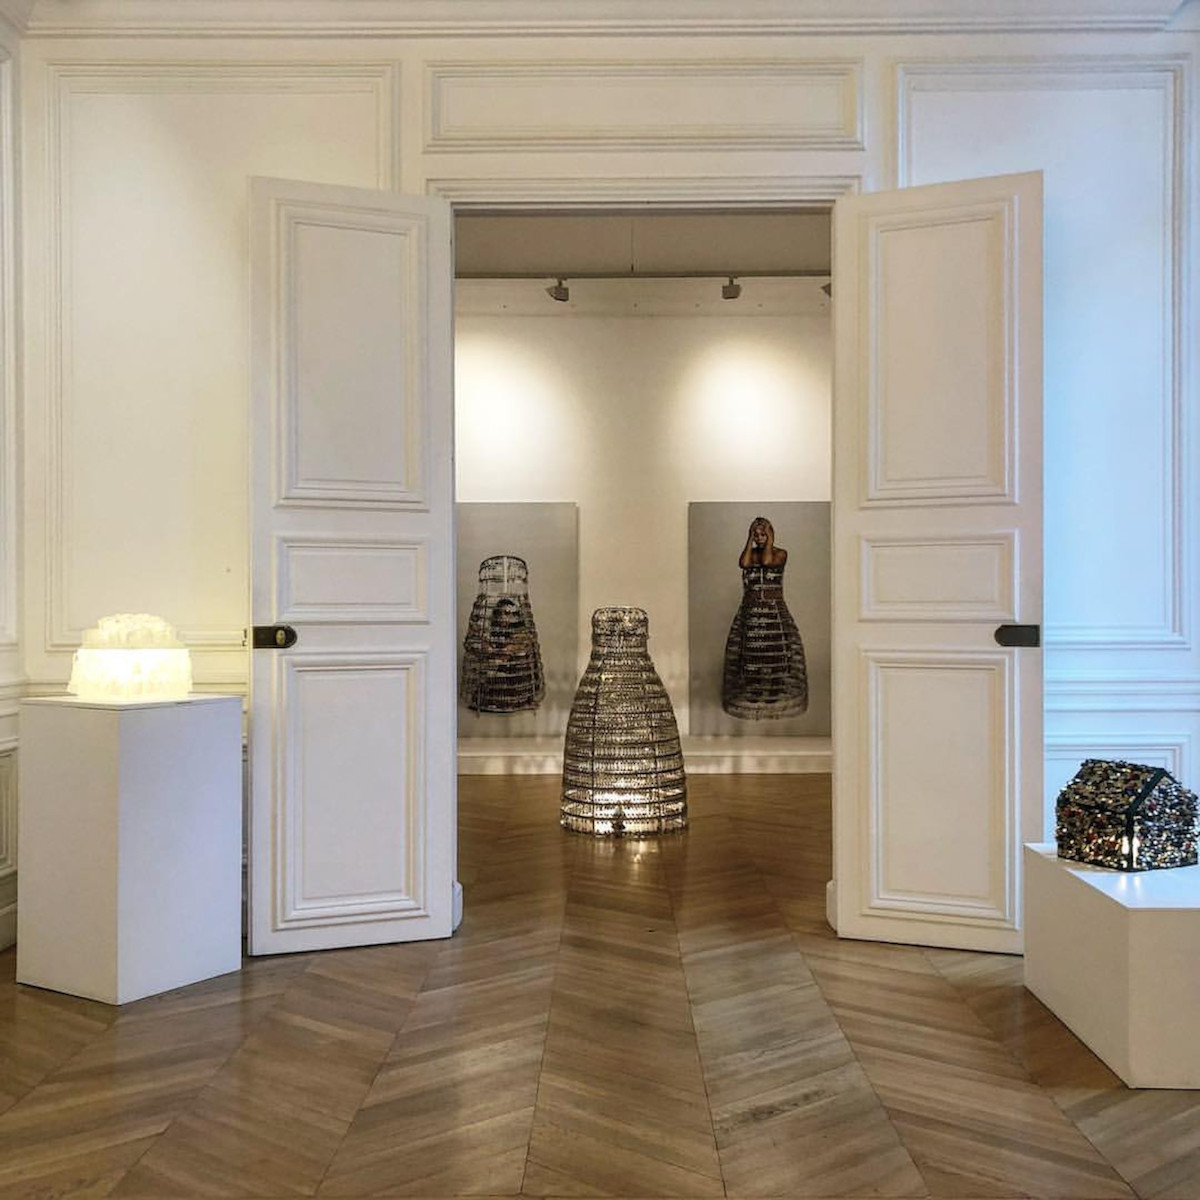 "Carmen Mariscal ""La esposa esposada (l'épouse menottée)"", 2018 Ana Mas Projects at Art Paris 2019"